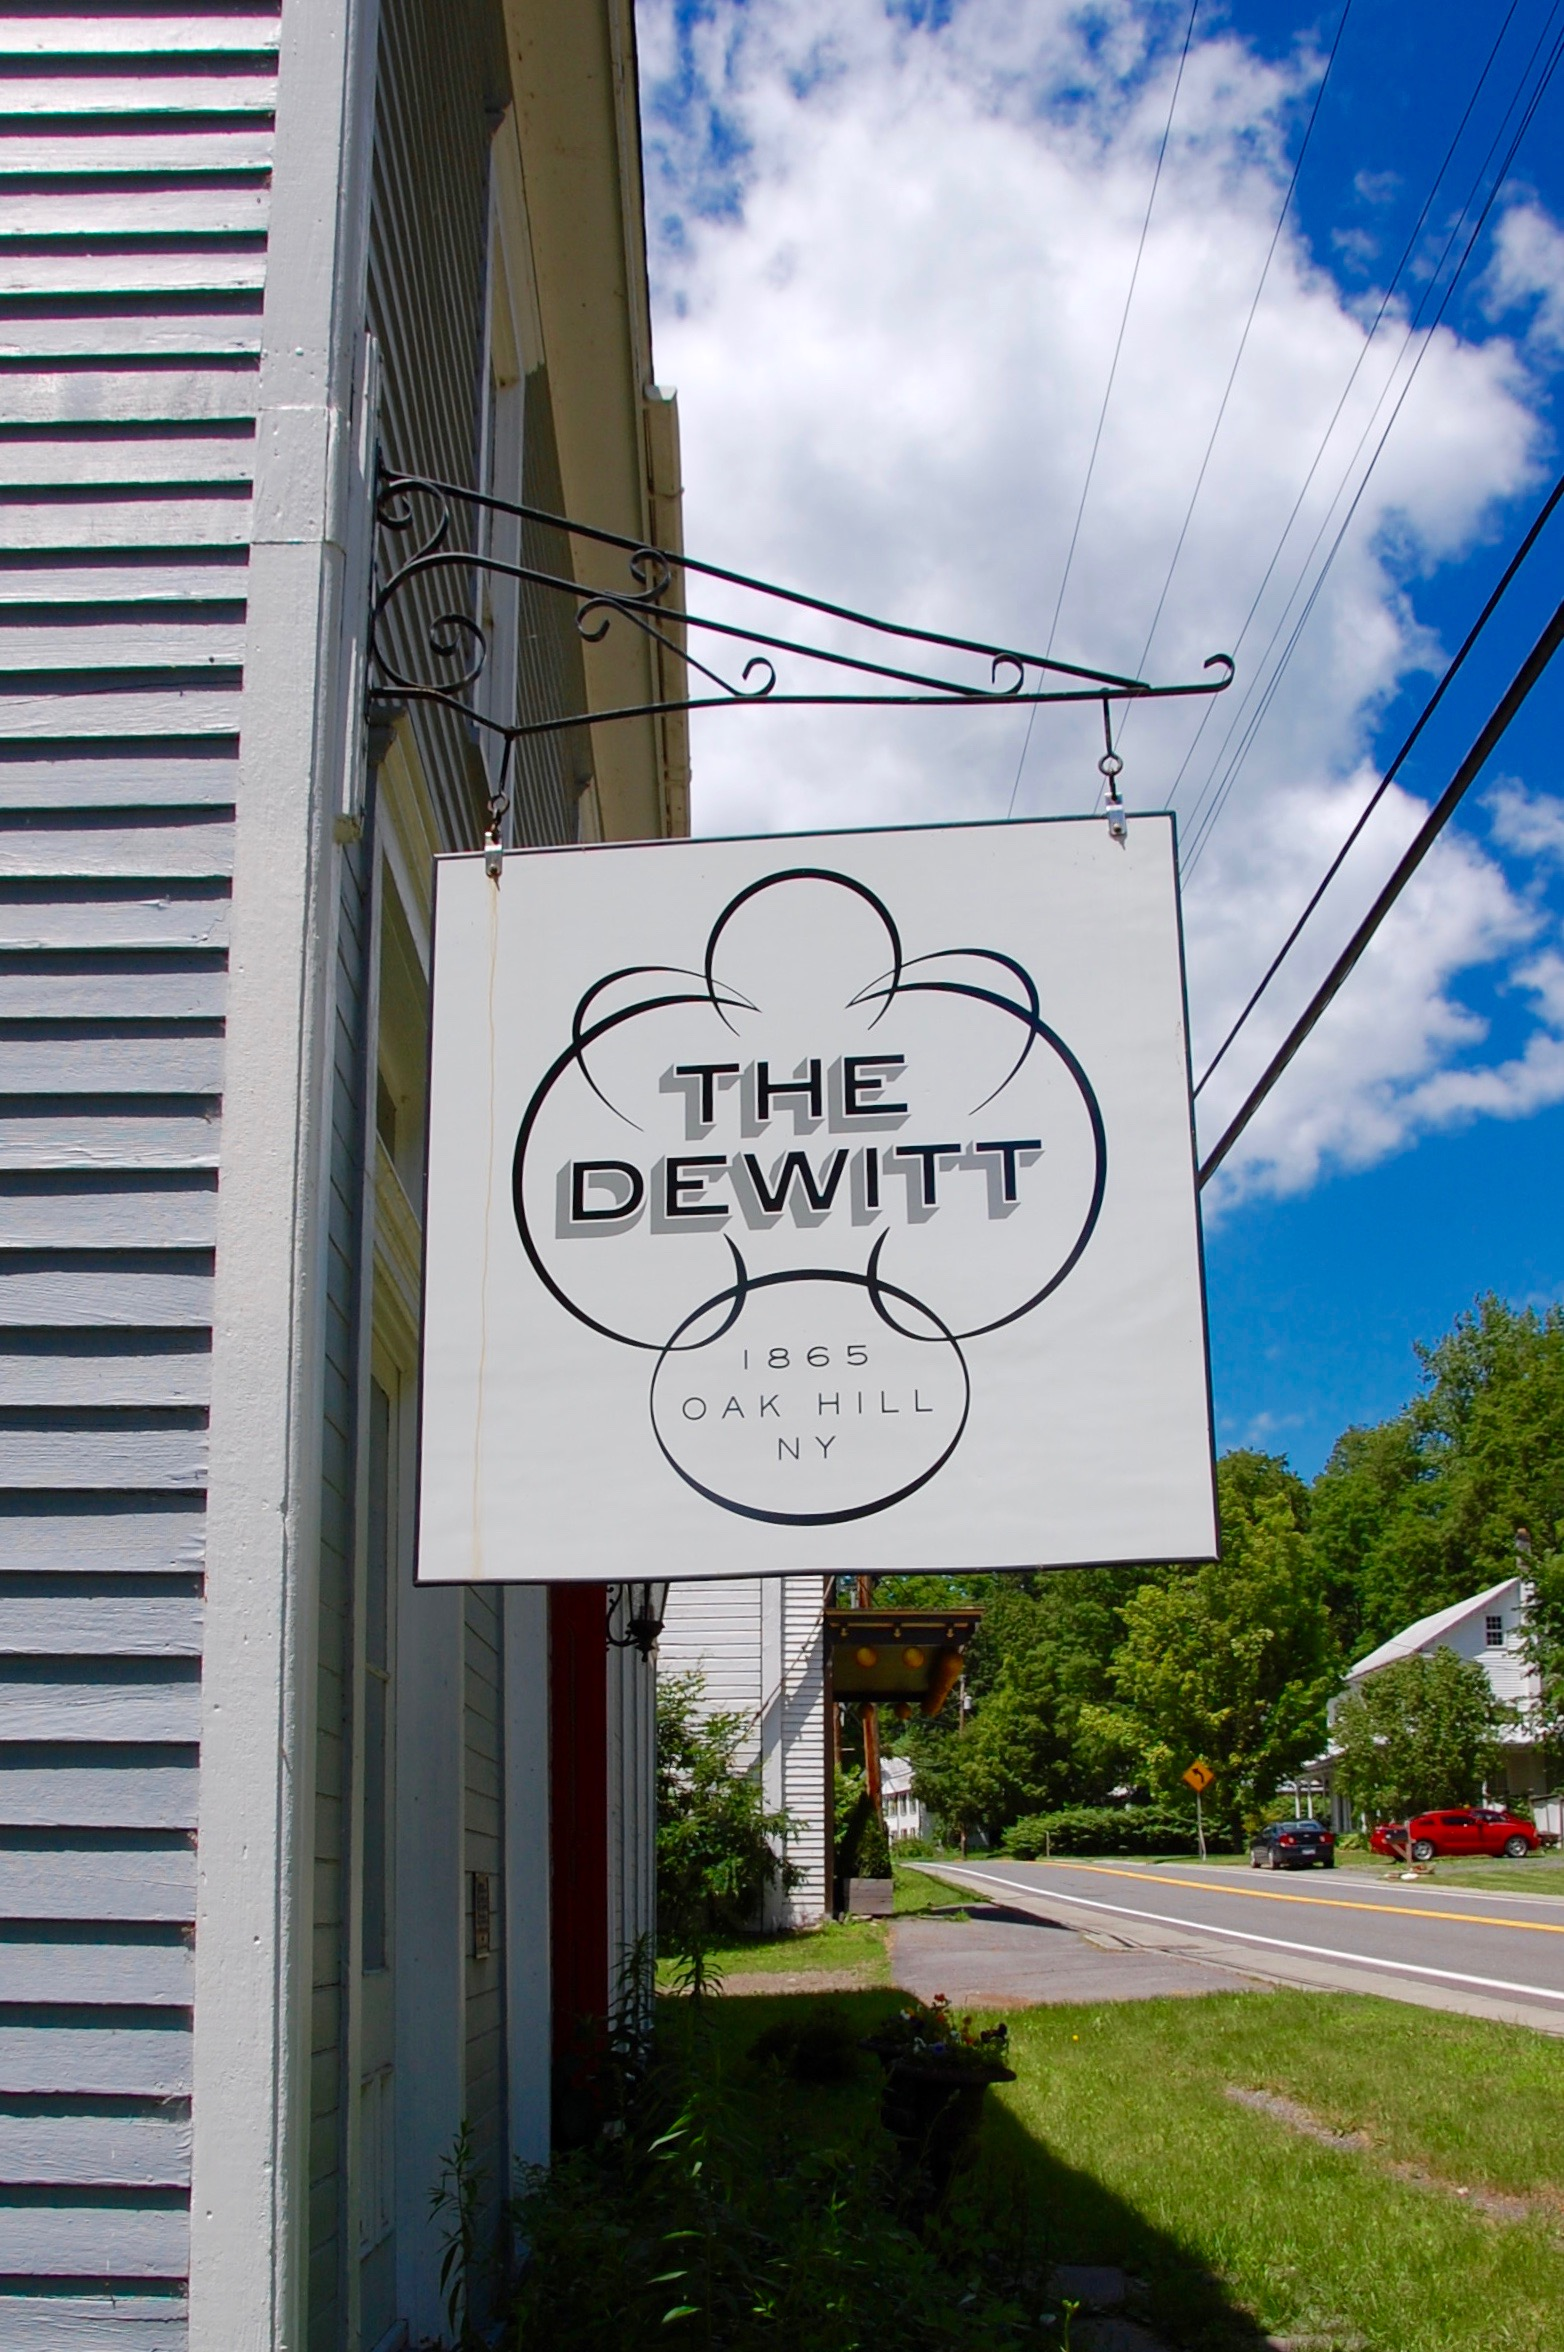 Dewitt Oak Hill